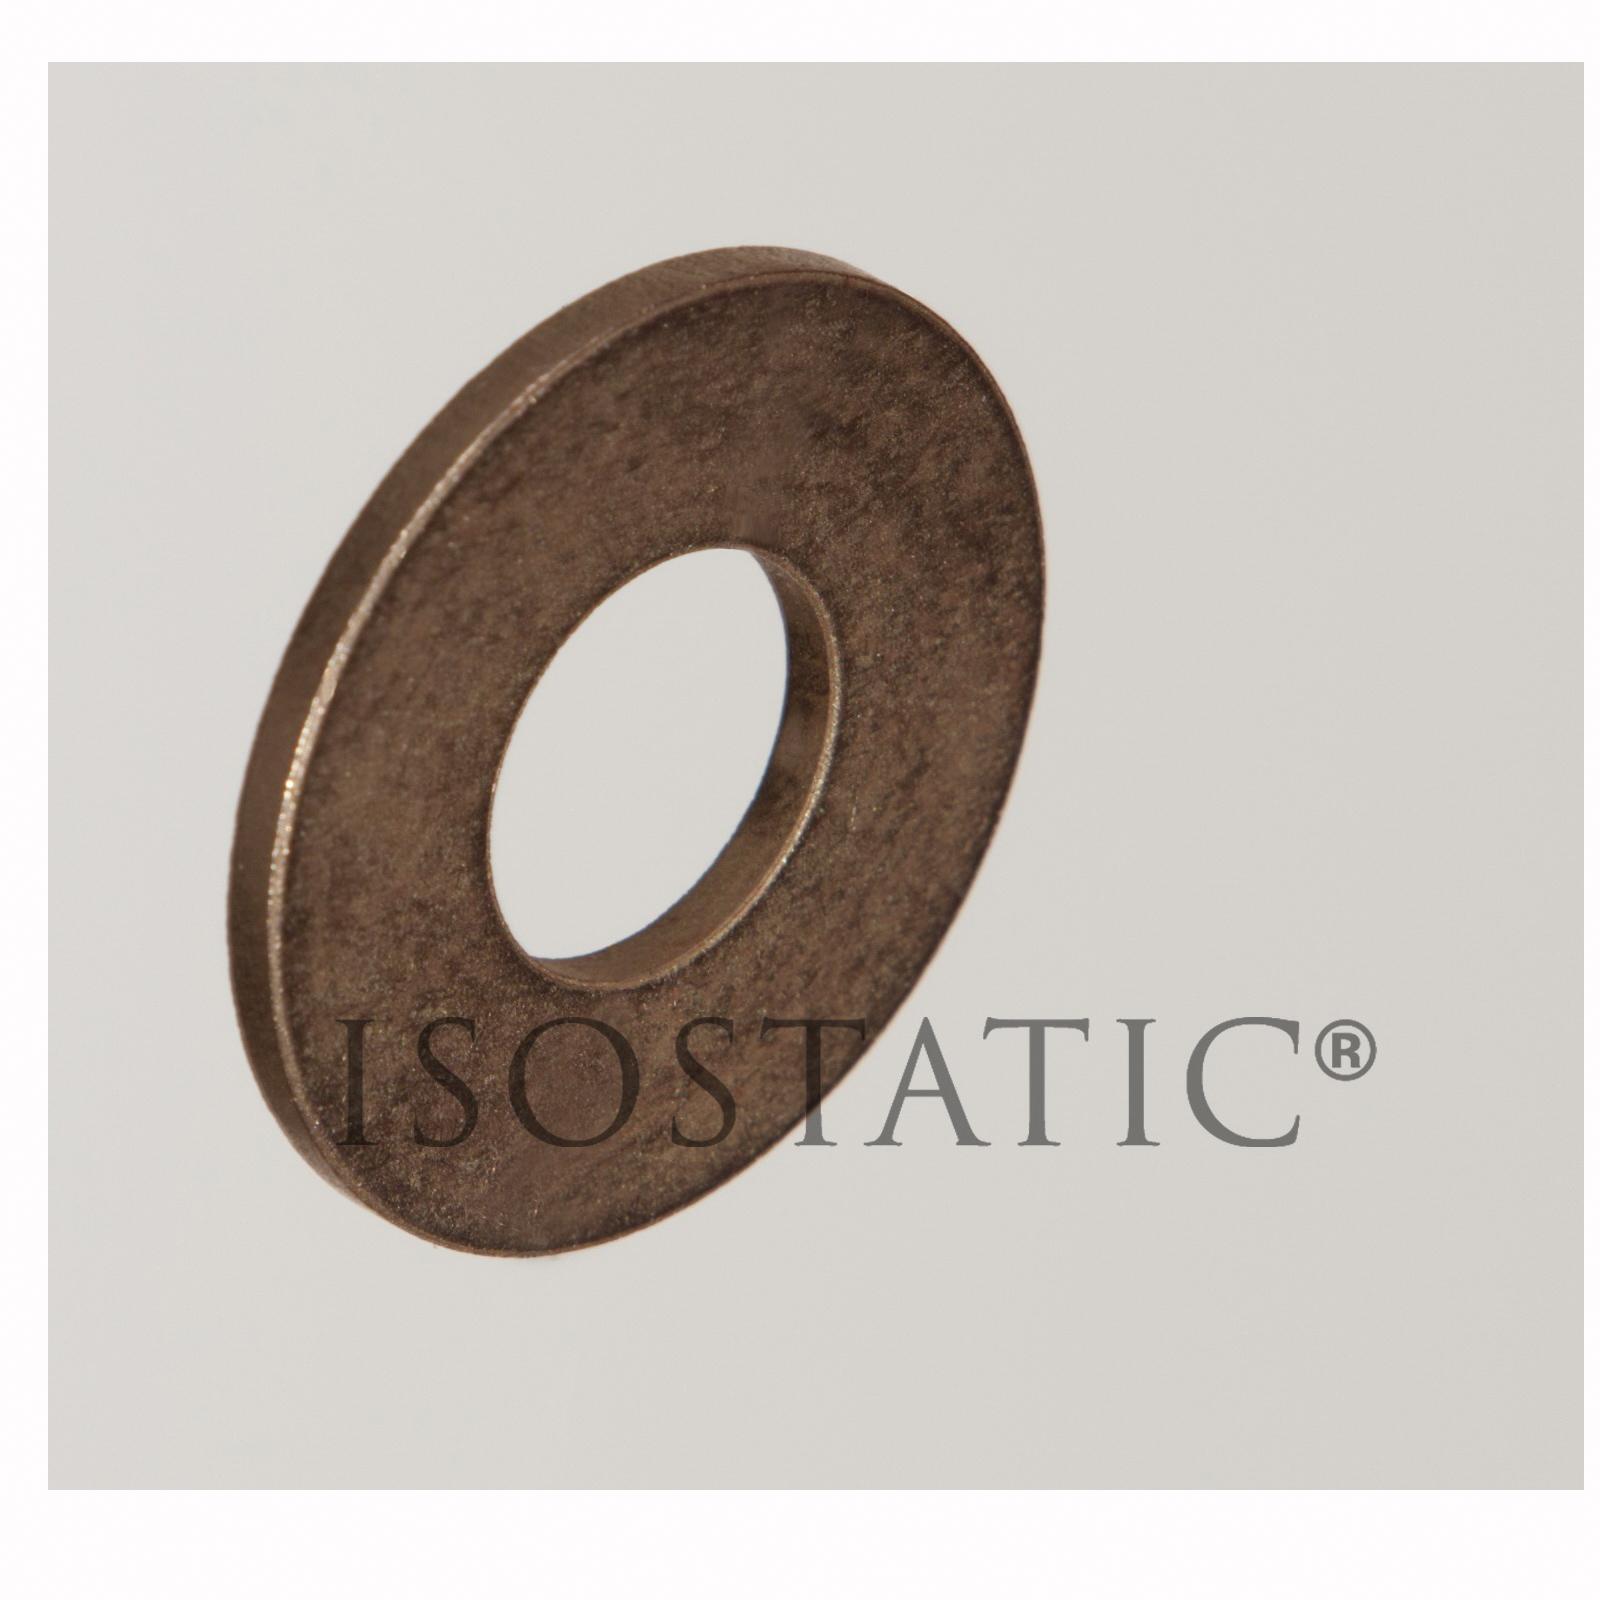 ISOSTATIC™ 102459